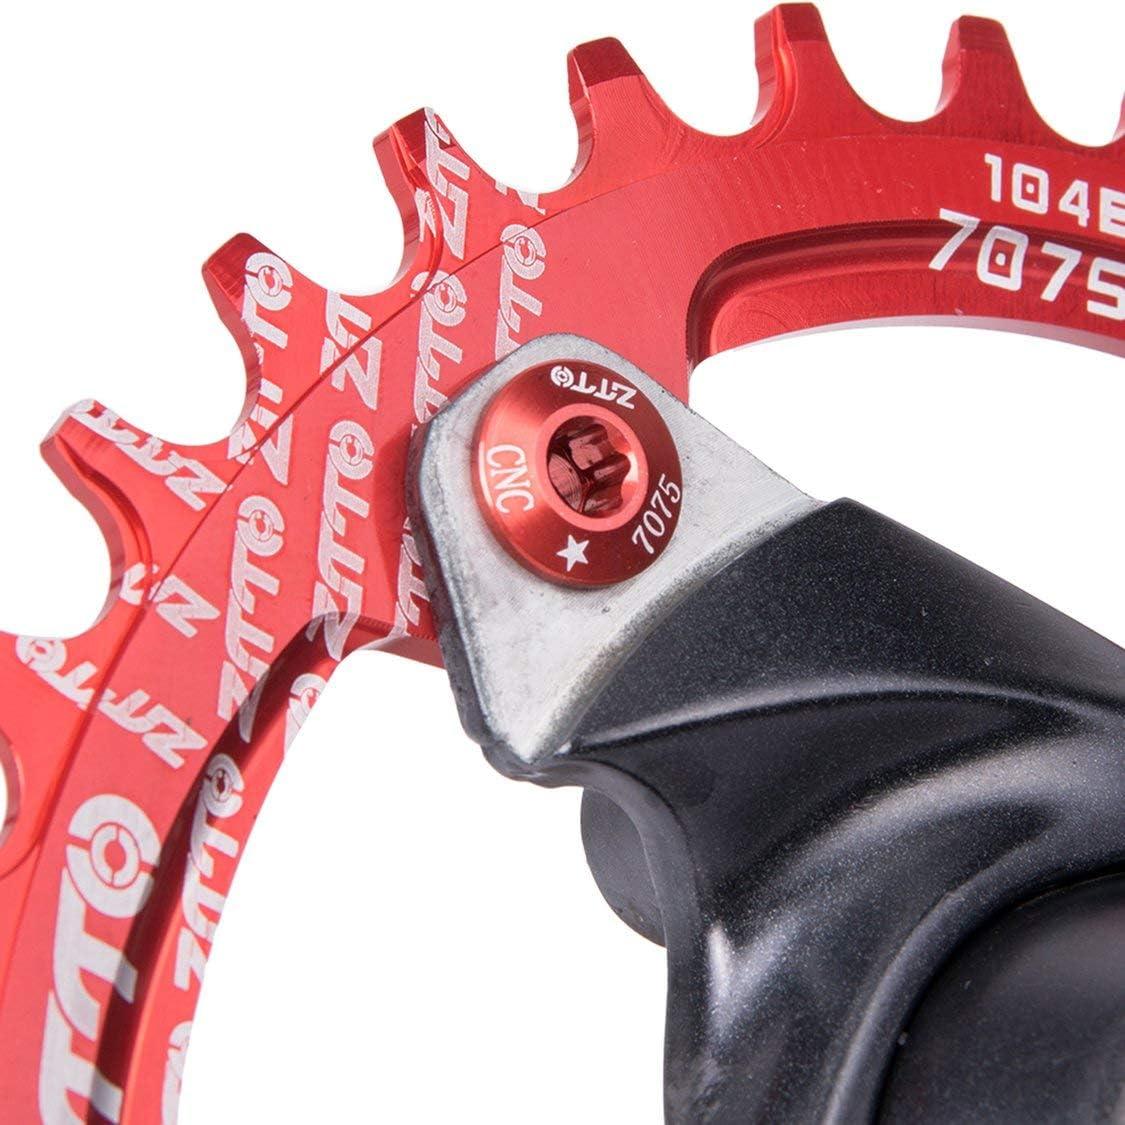 Fancysweety 5PCS//SET Aluminum Alloy Chainring Bolt Bicycle Chainwheel Screws Road MTB Bicycle Disc Screws for Crankset